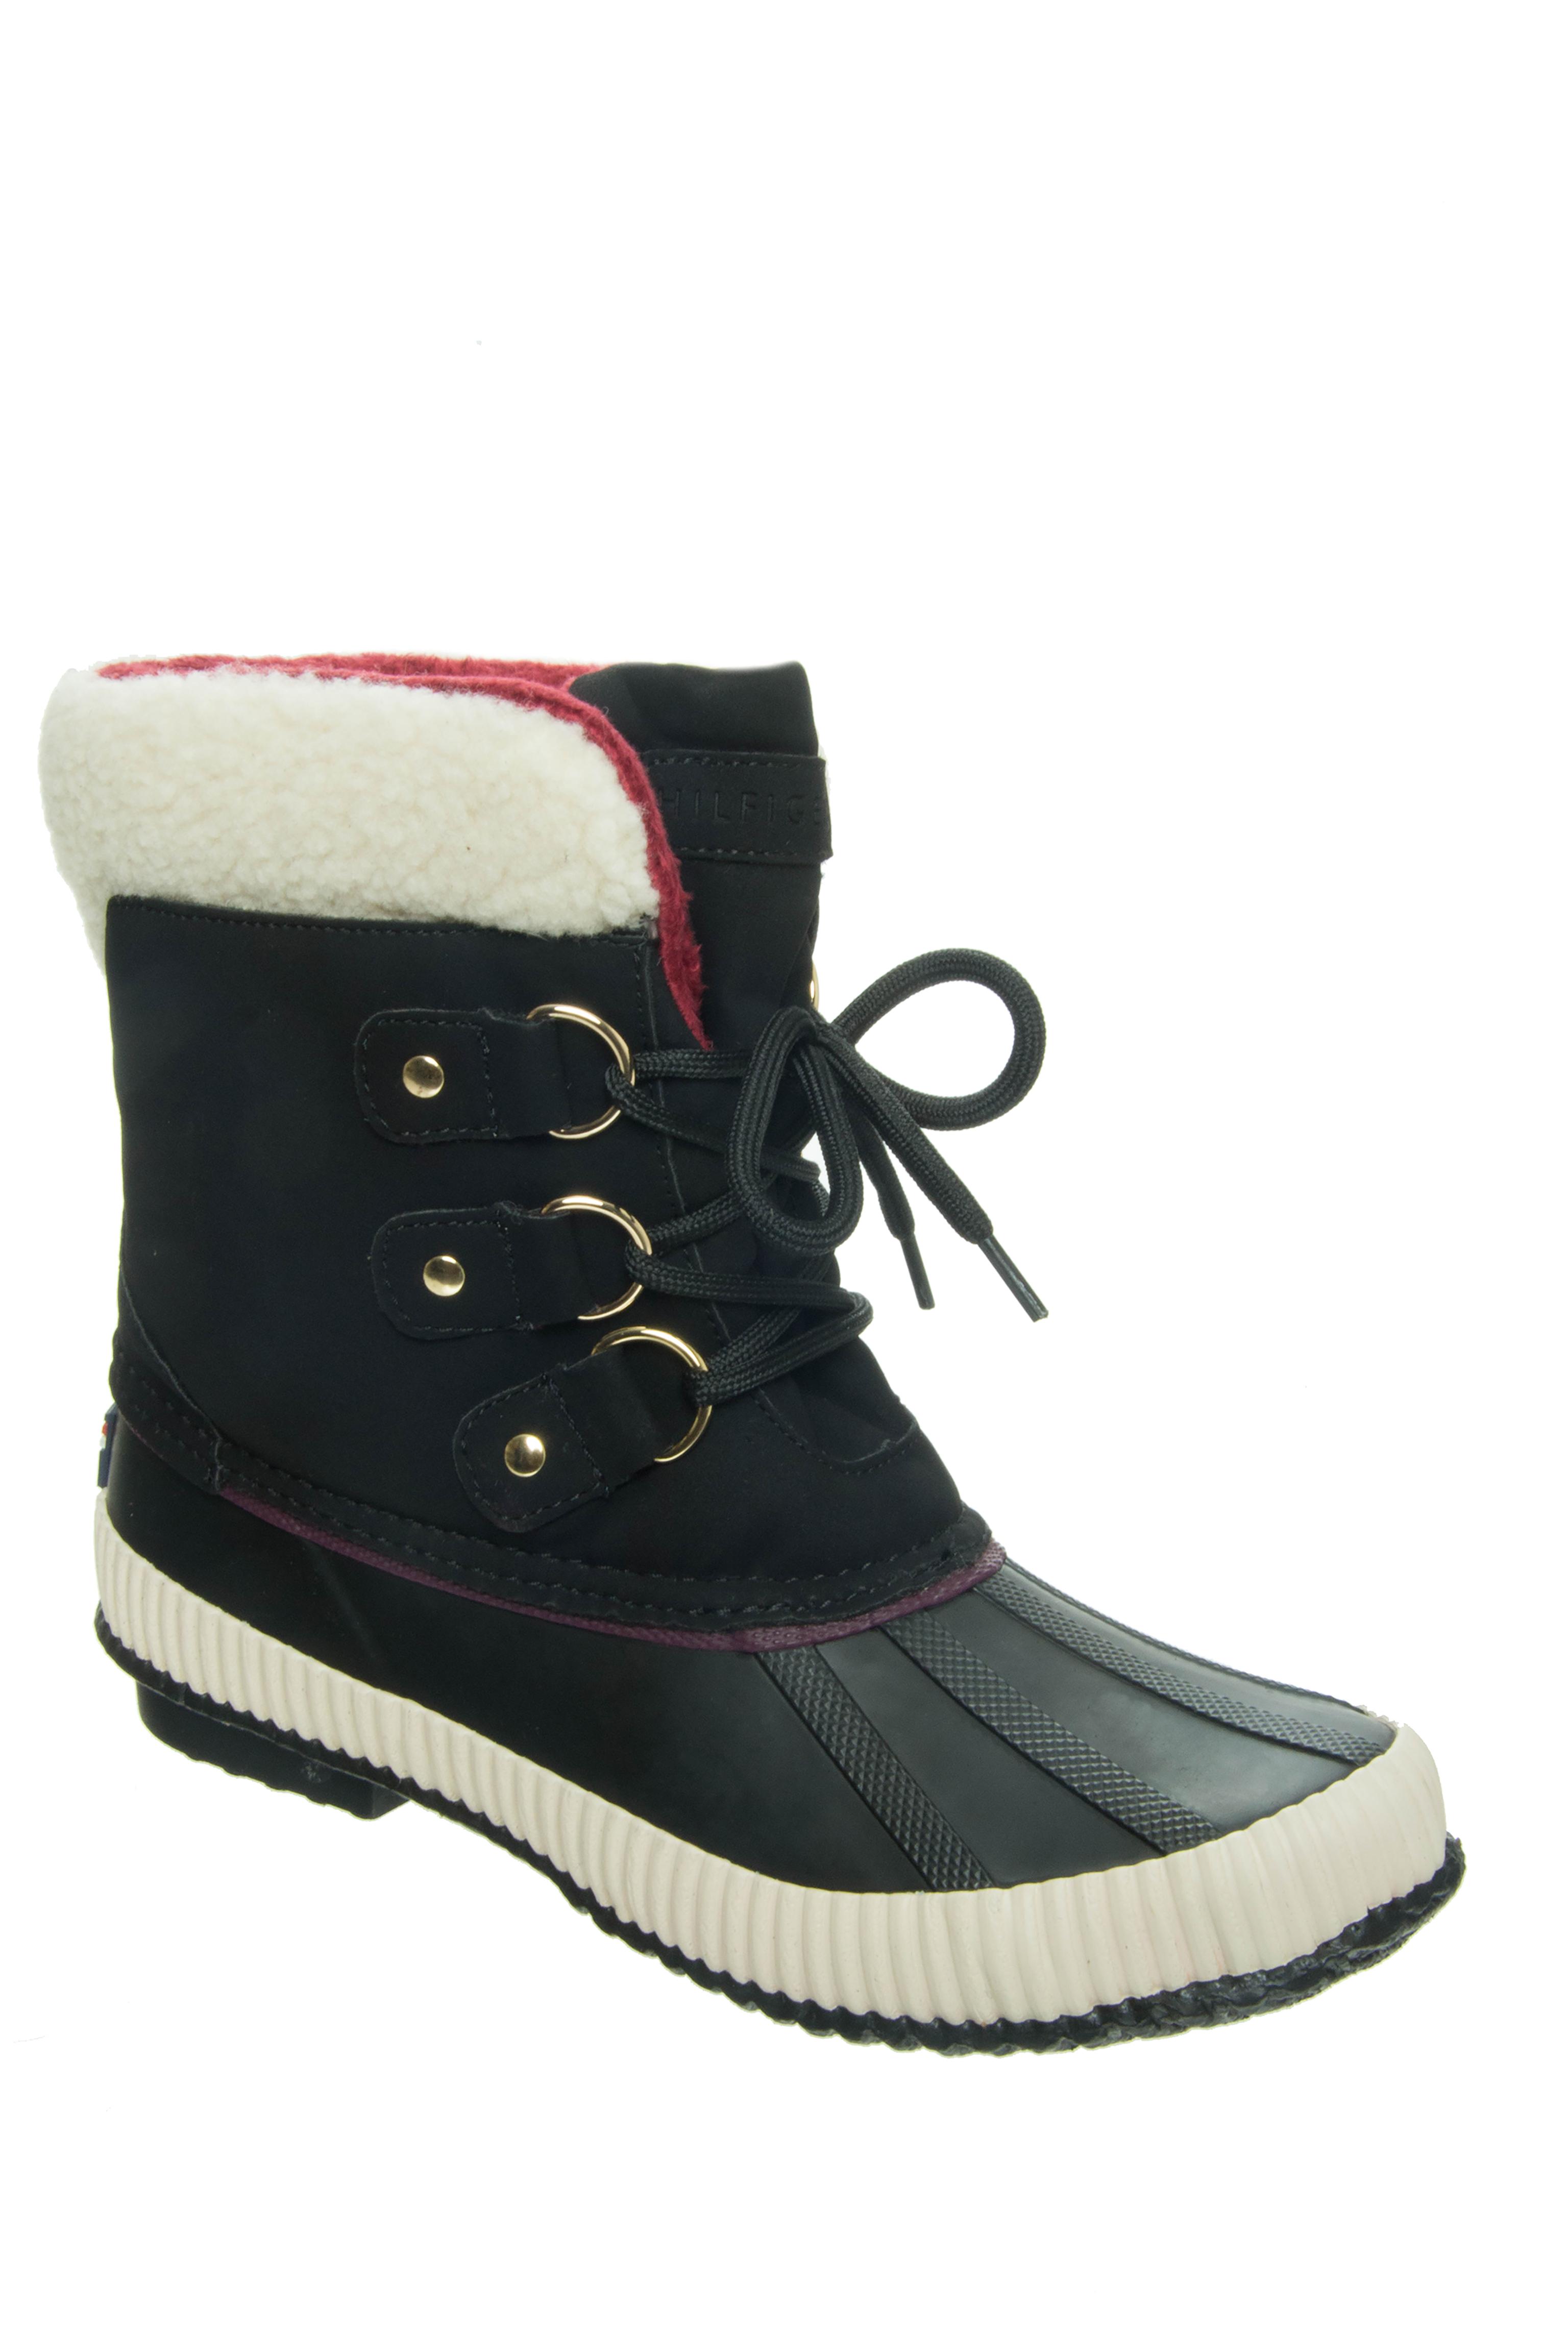 Tommy Hilfiger Ebonie Low Heel Duck Snow Boots - Black Multi